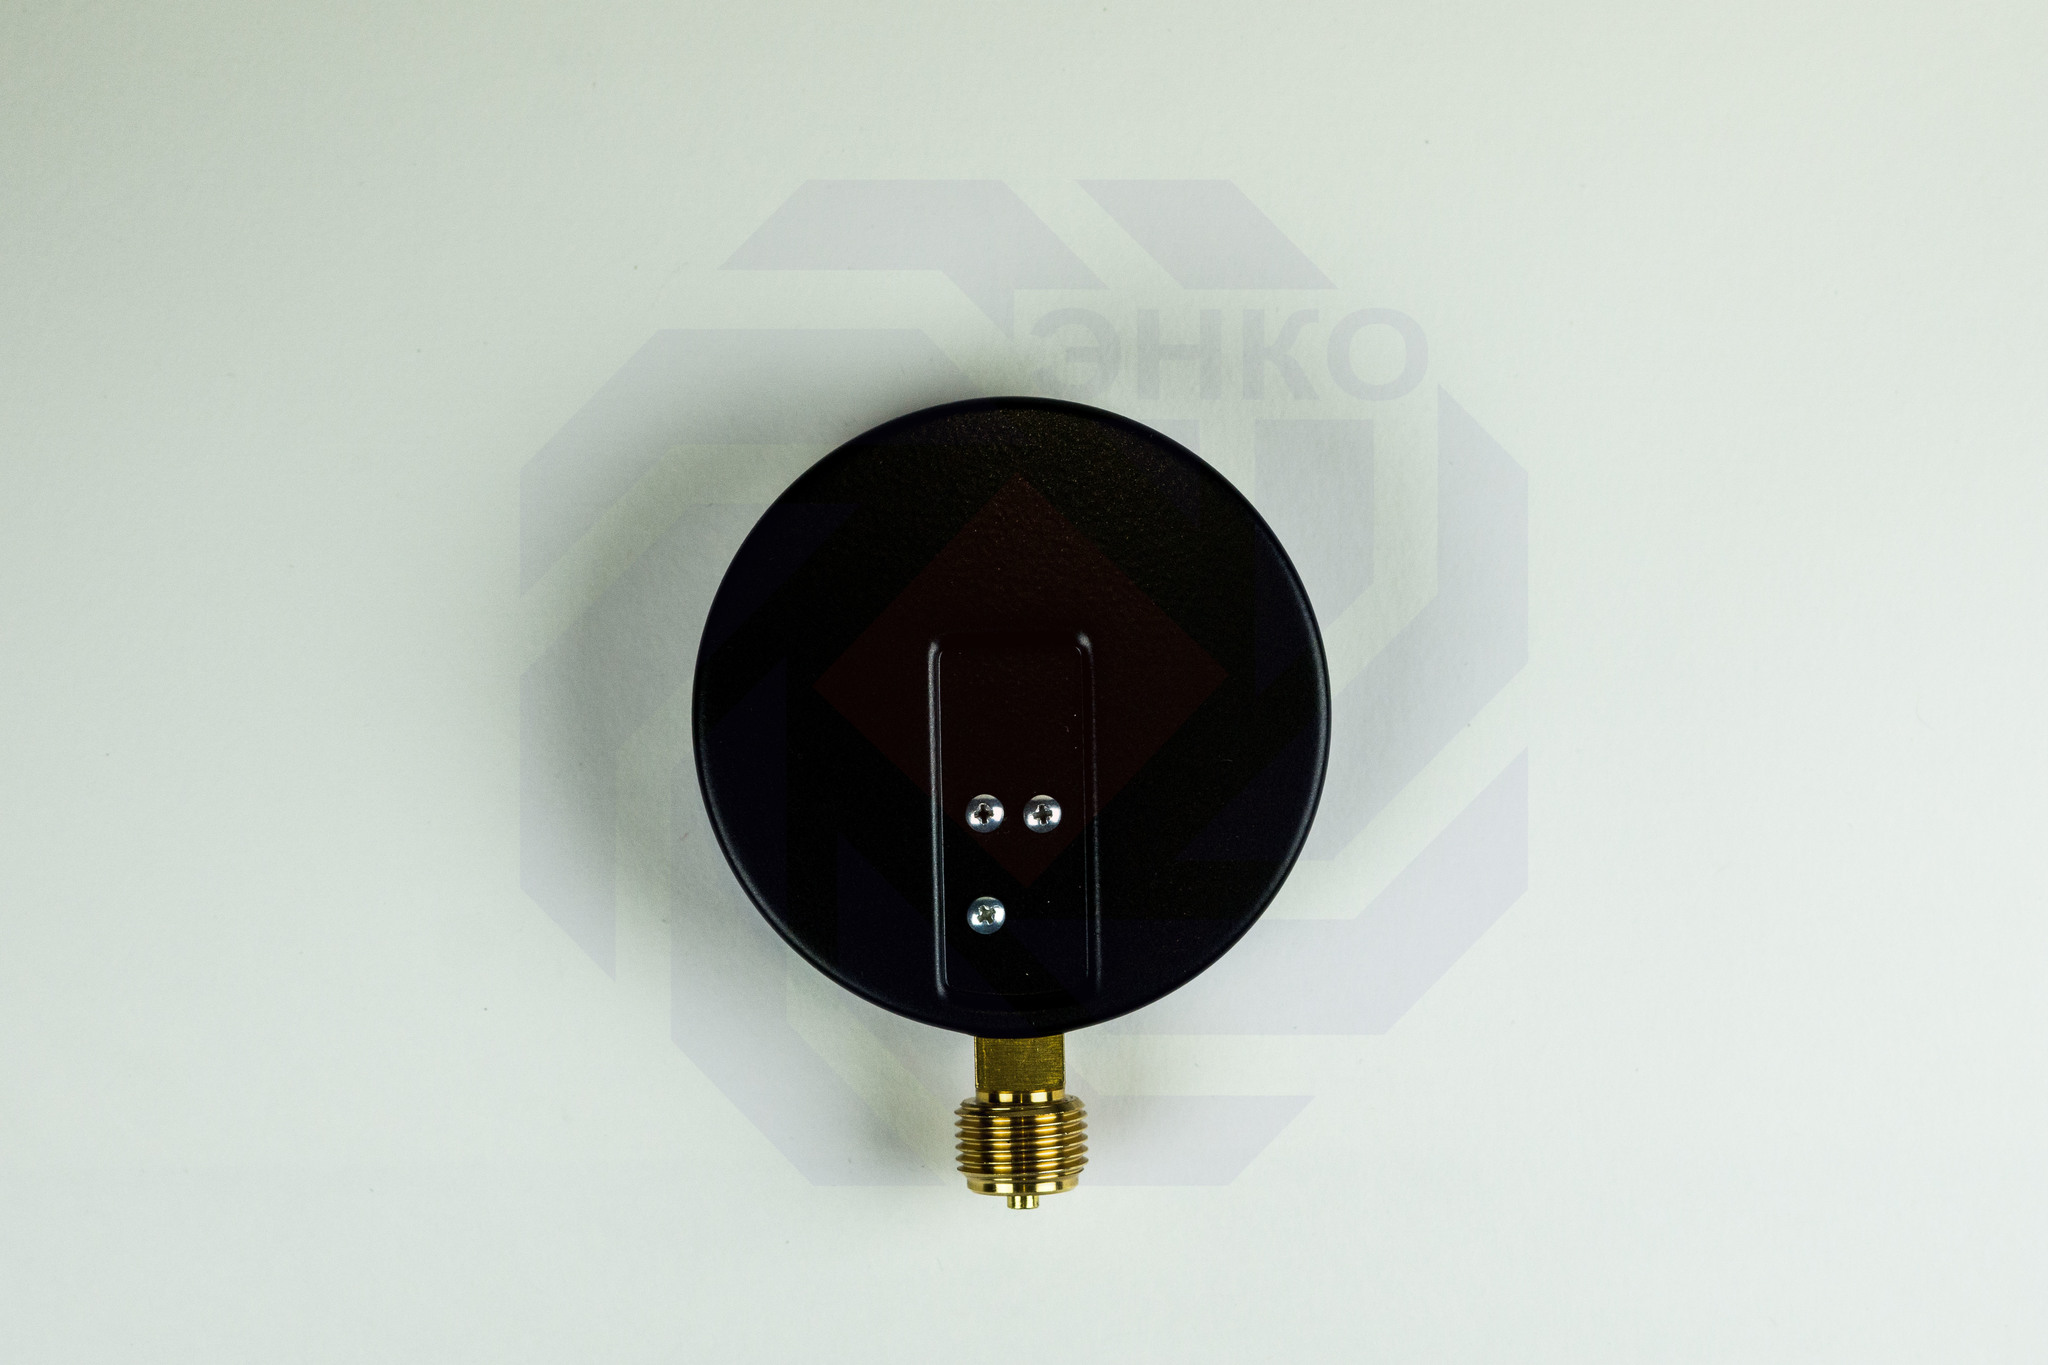 Манометр радиальный WATTS MDR 100/16 (F+R250) 0-16 бар 100 мм ½